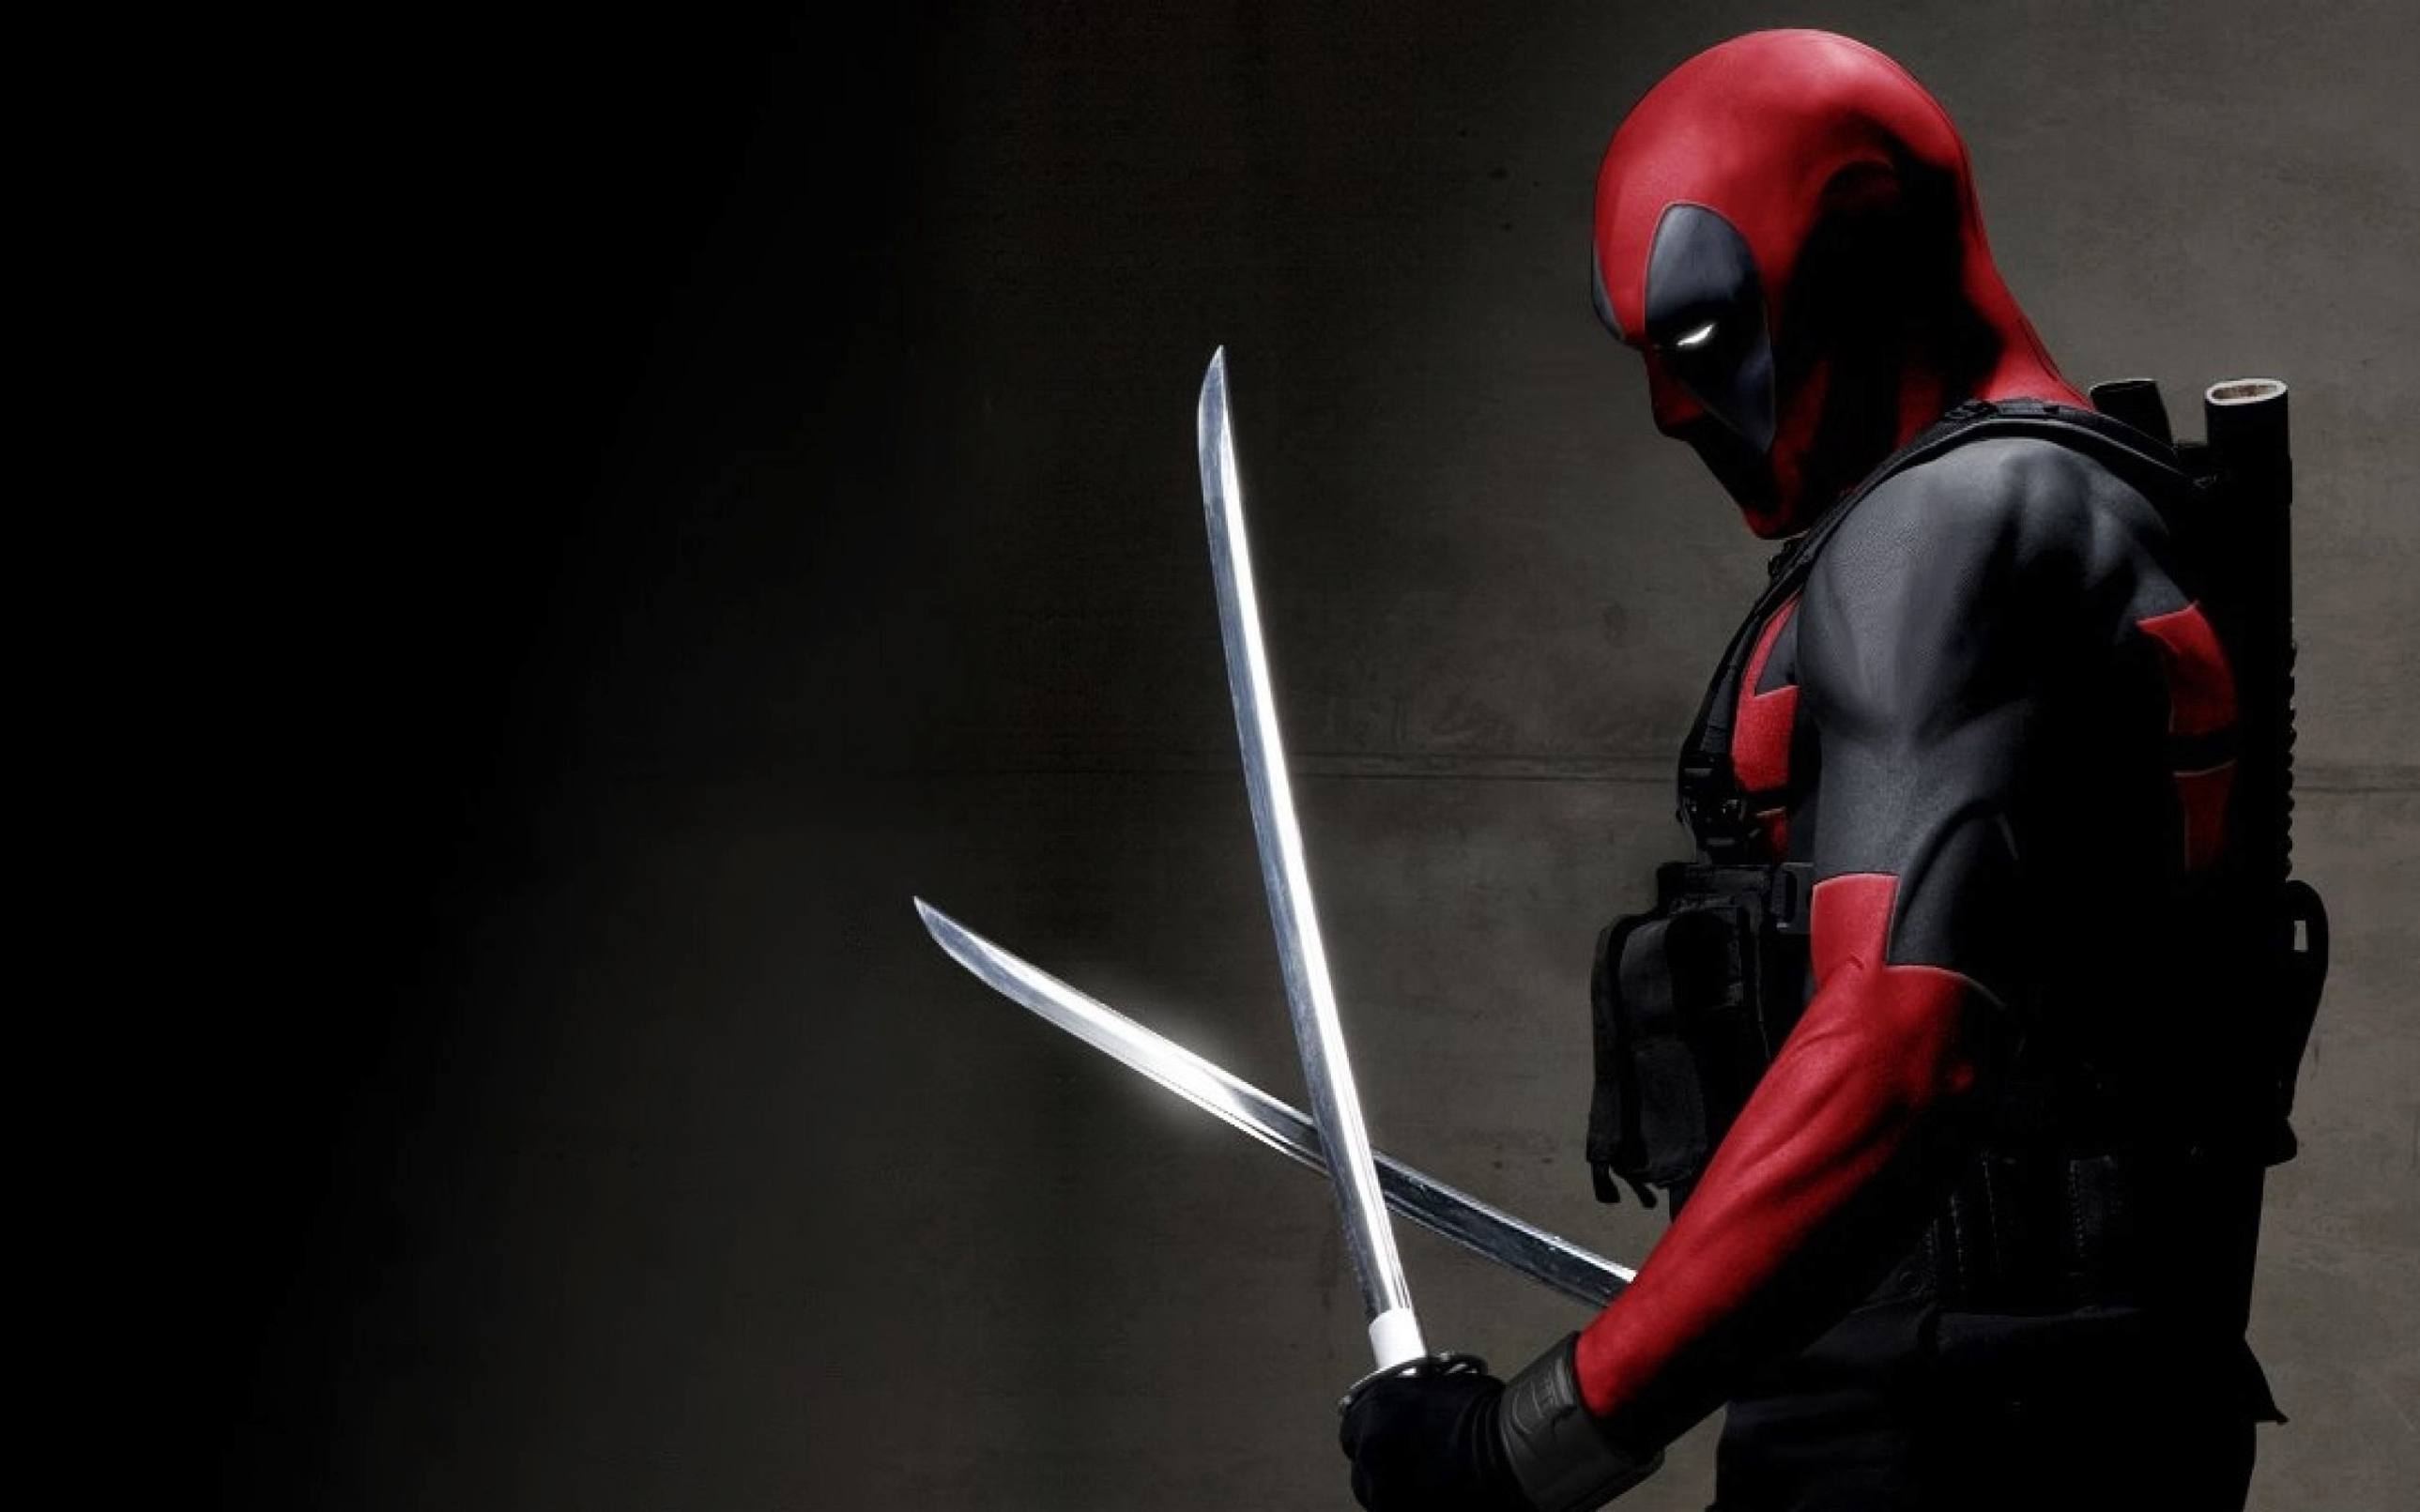 Deadpool wallpaper hd wallpapersafari - Deadpool download 1080p ...